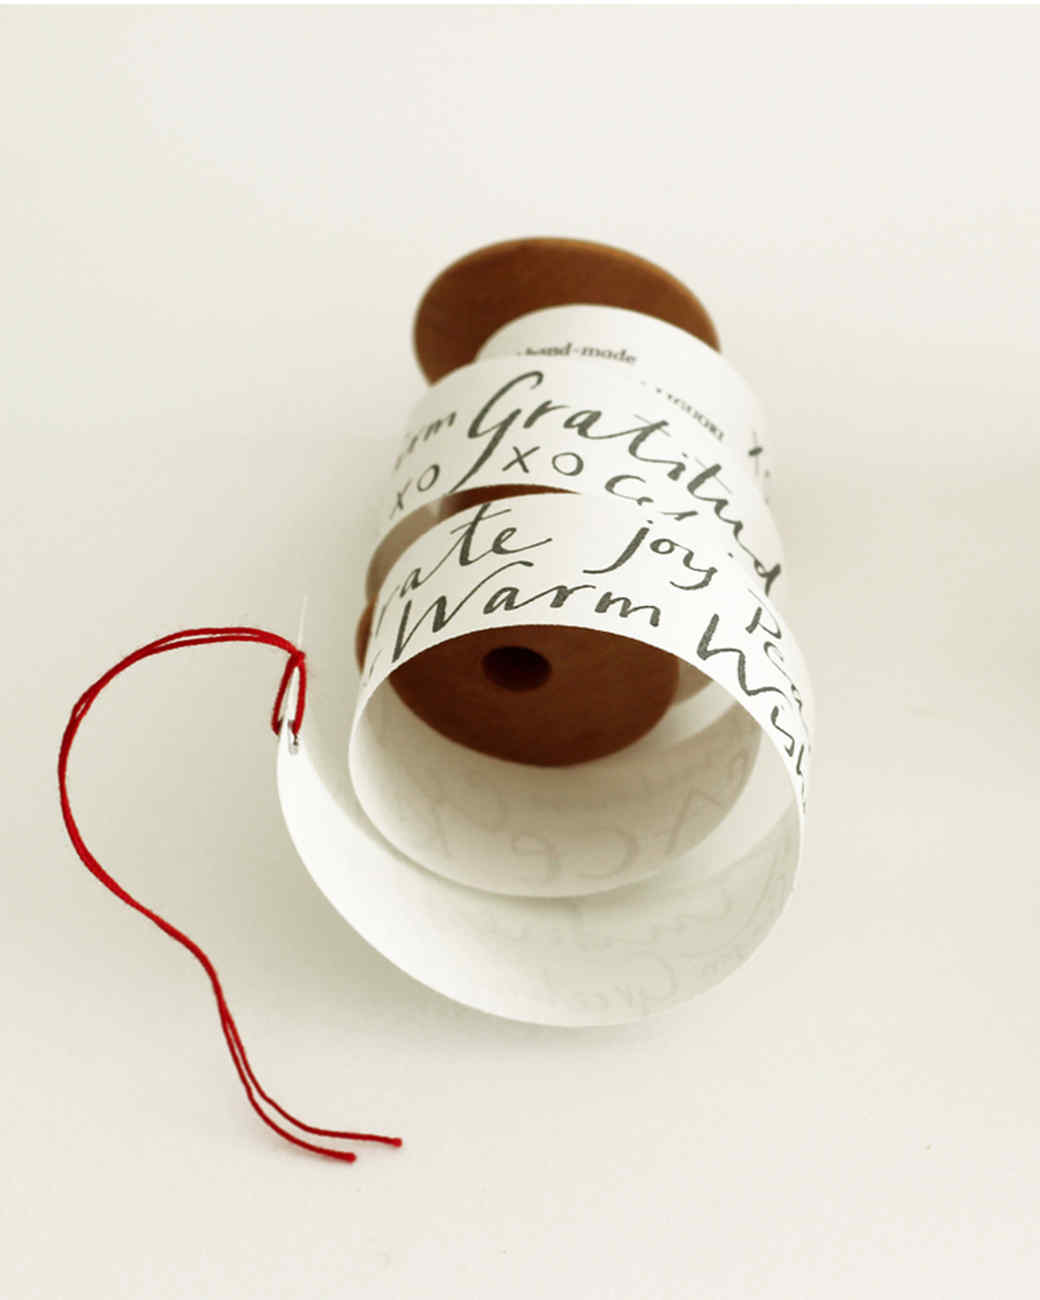 studio-carta-rotolino-greetings-0414.jpg